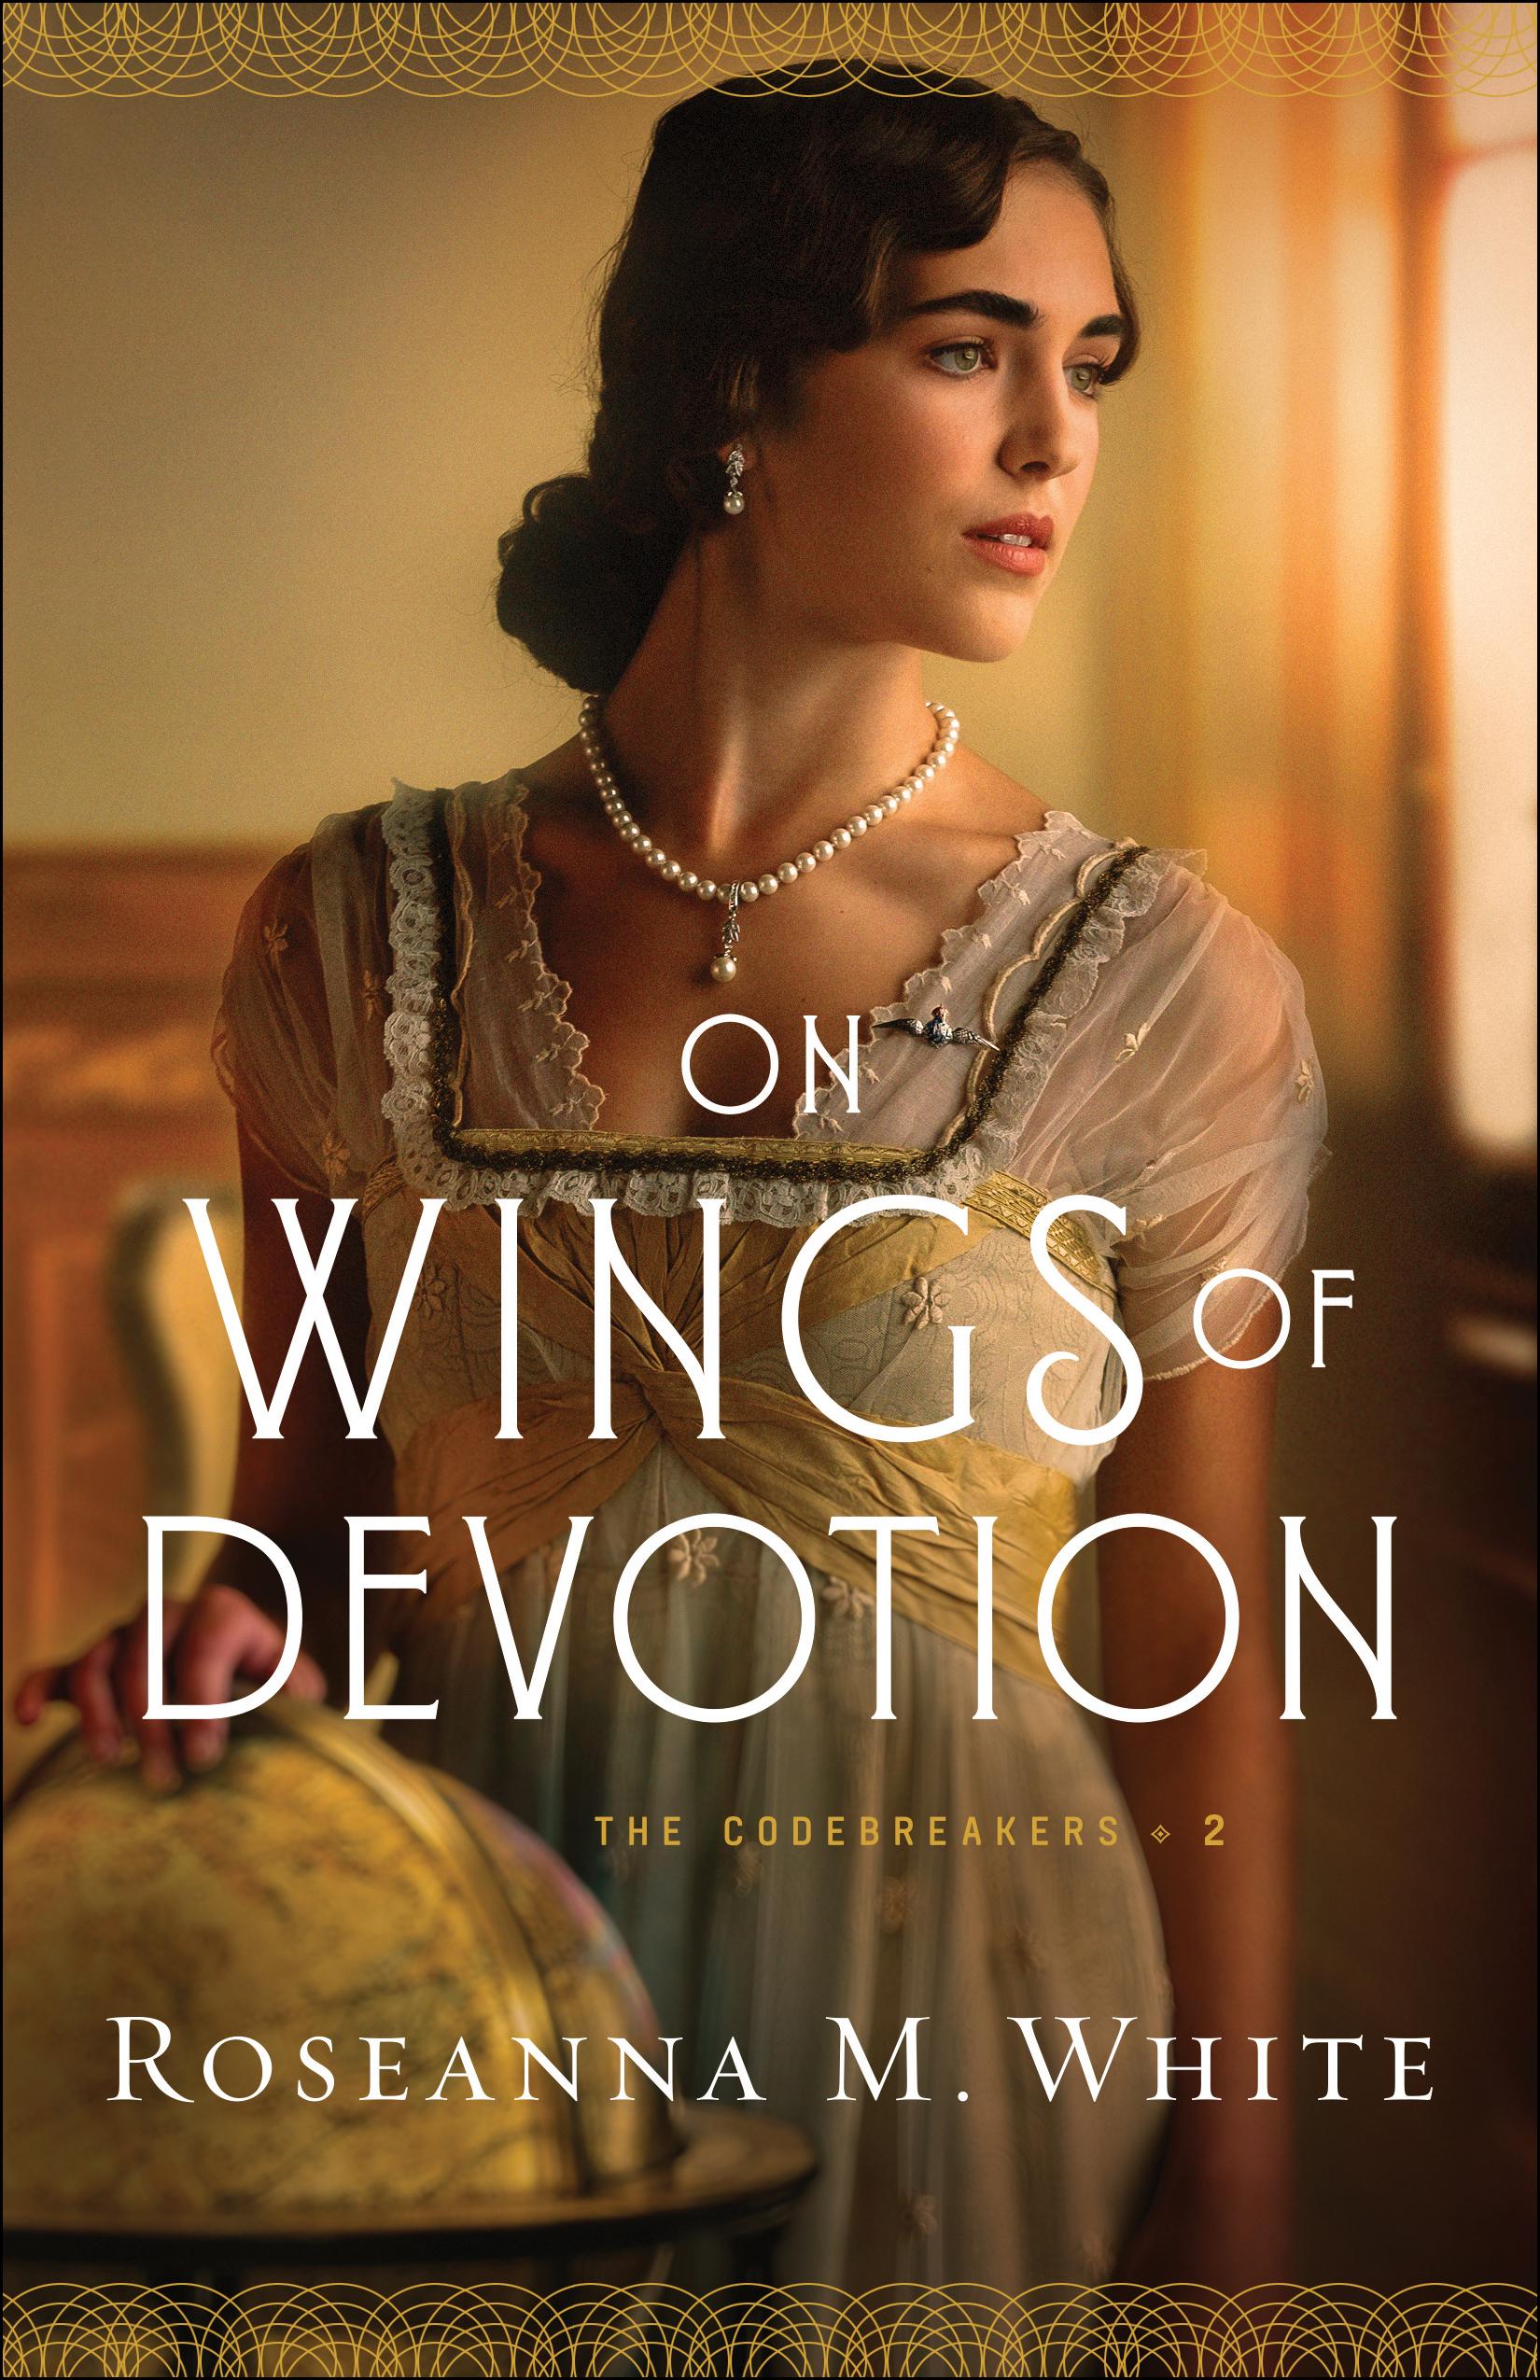 On Wings of Devotion (The Codebreakers Book #2)